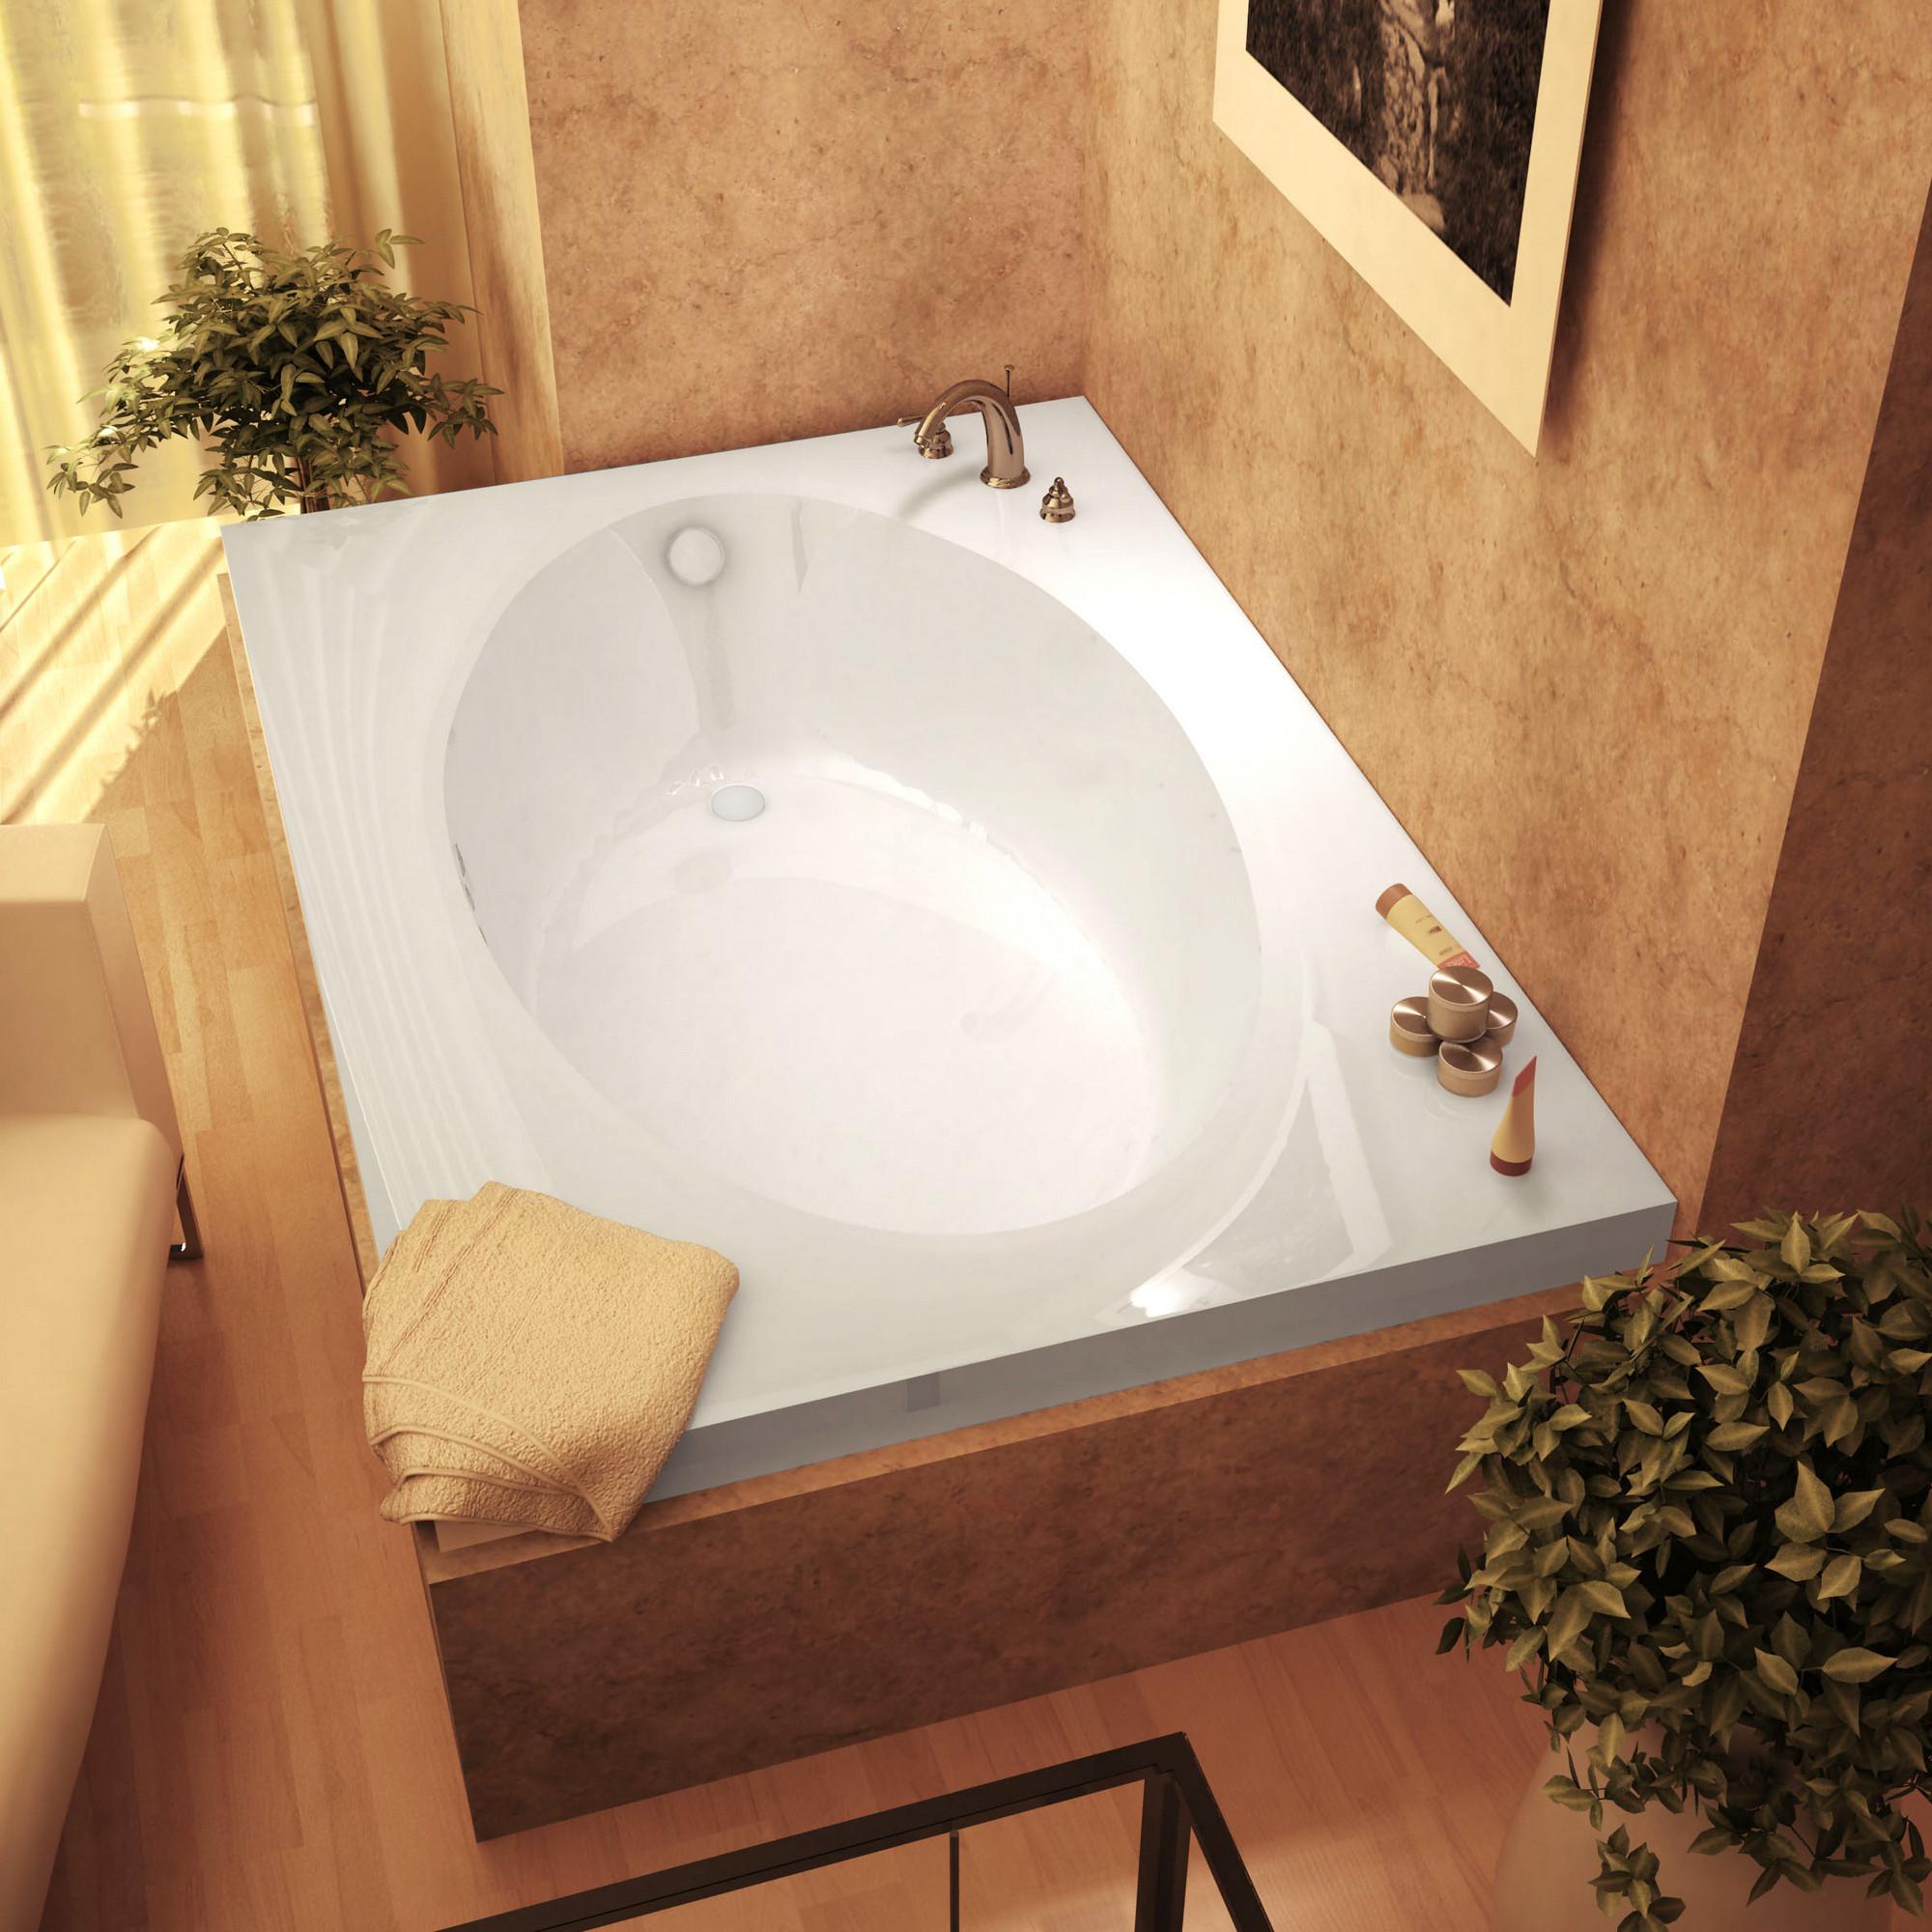 MediTub 4272V Atlantis Vogue Rectangular Soaking Tub With Reversible Drain